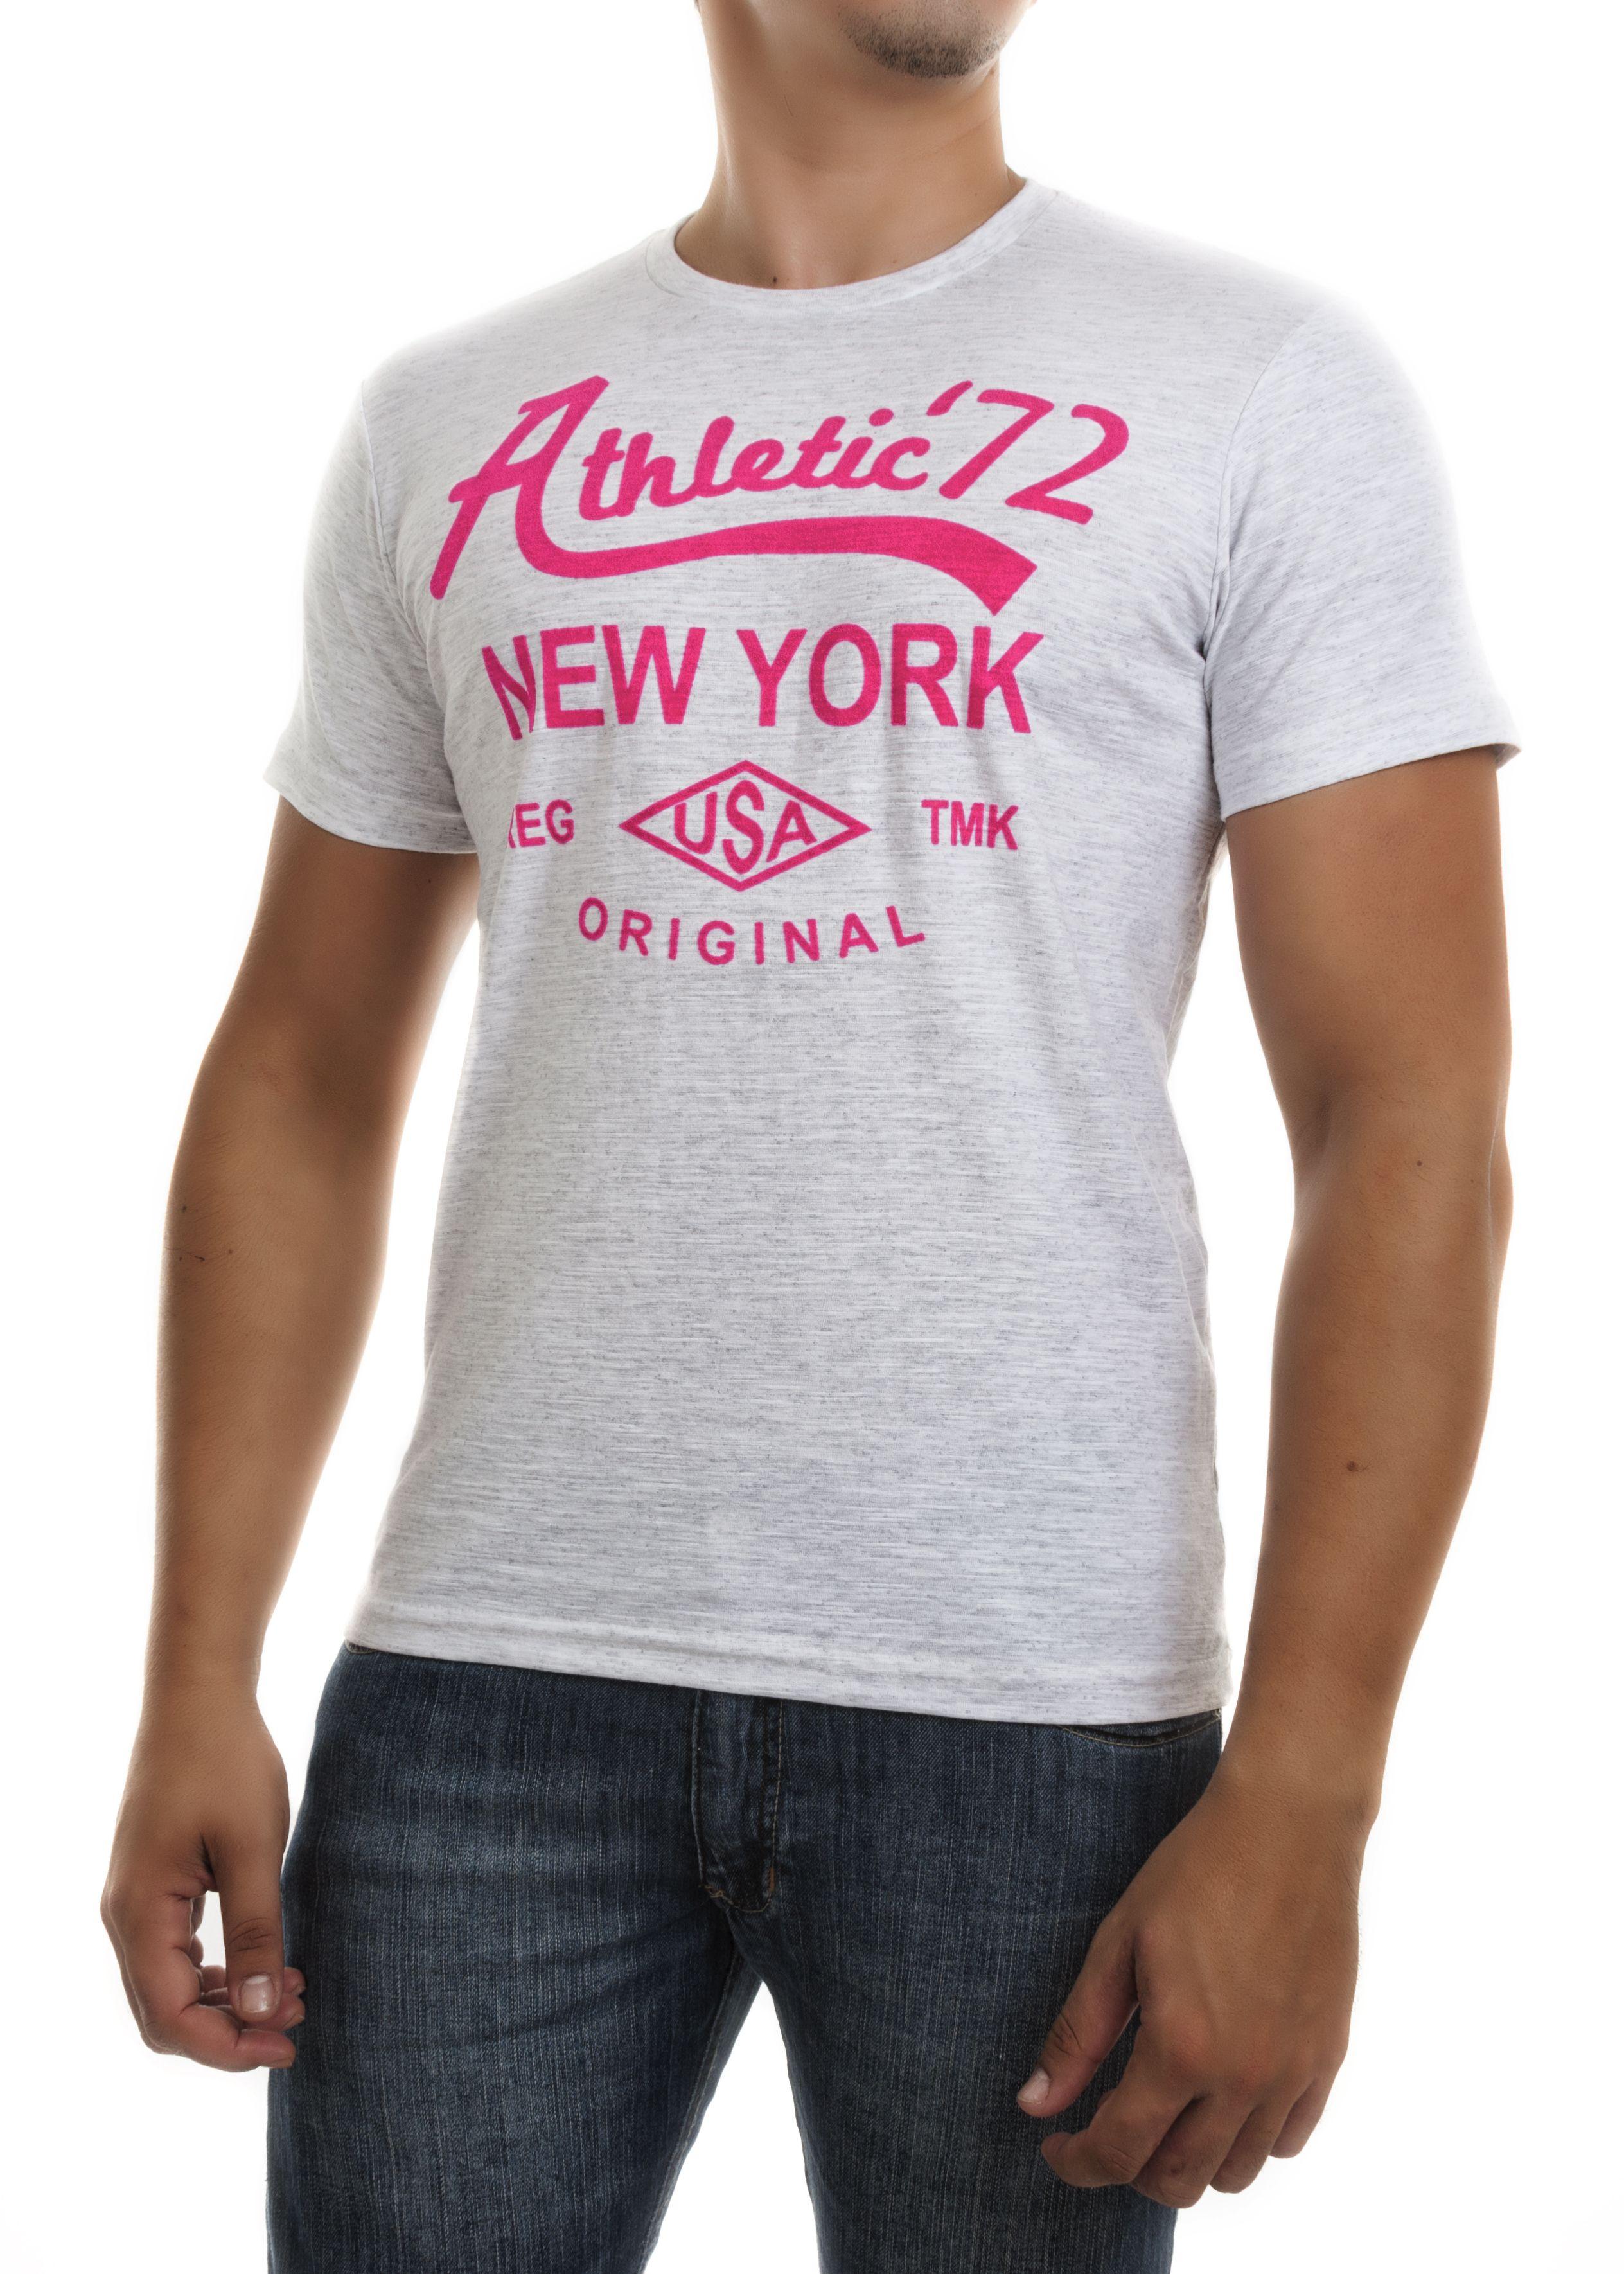 Atlhetic 72